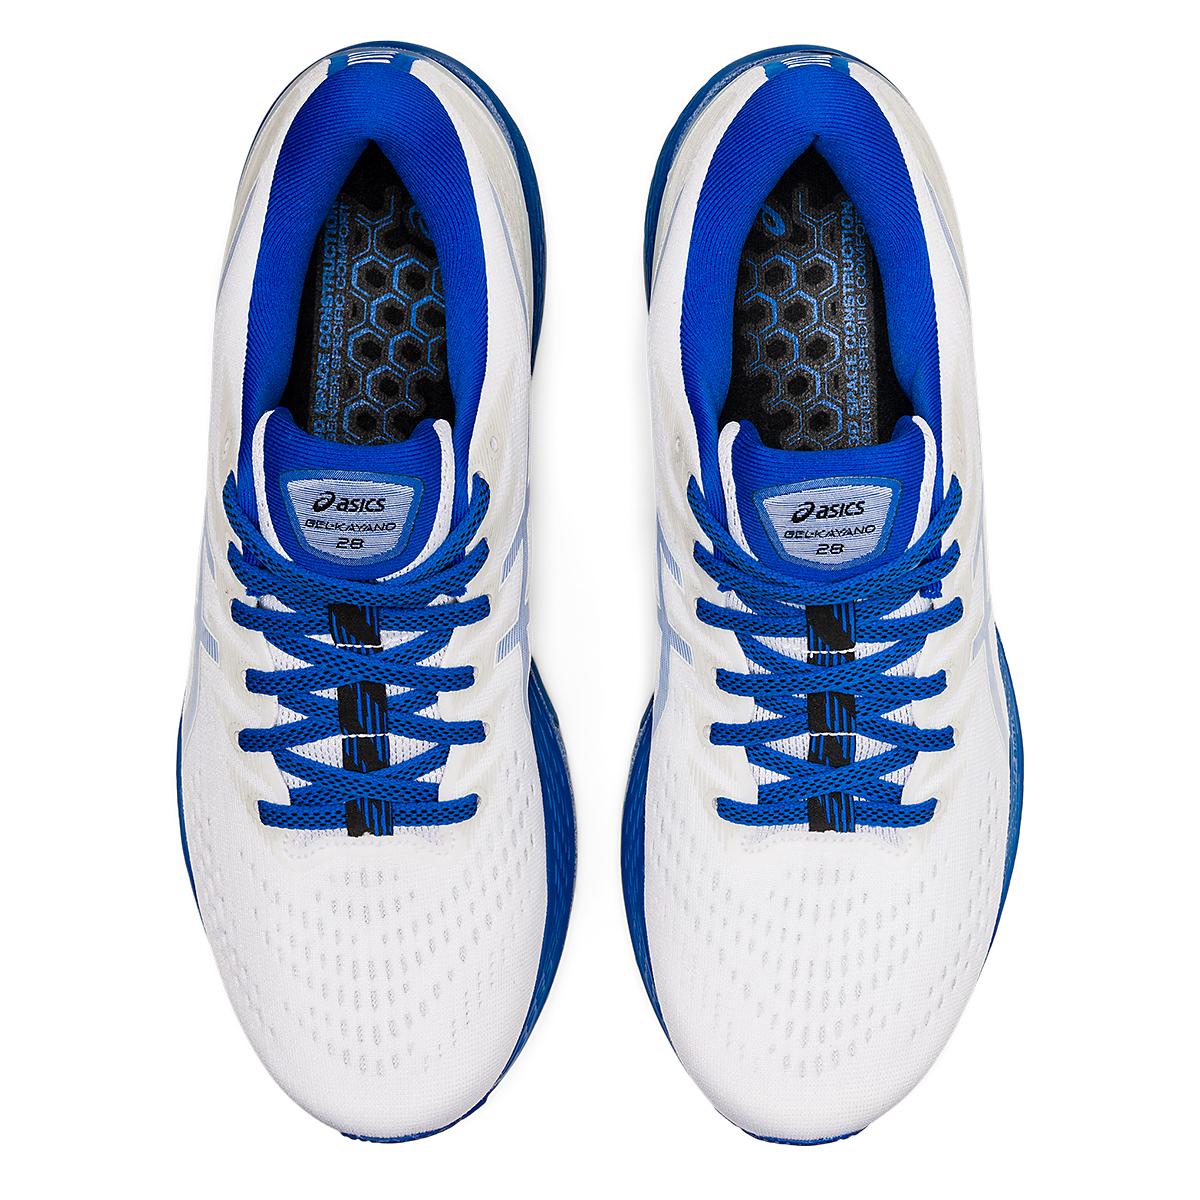 Men's Asics Gel-Kayano 28 Running Shoe - Color: White/Tuna Blue - JackRabbit Exclusive - Size: 6.5 - Width: Regular, White/Tuna Blue - JackRabbit Exclusive, large, image 6